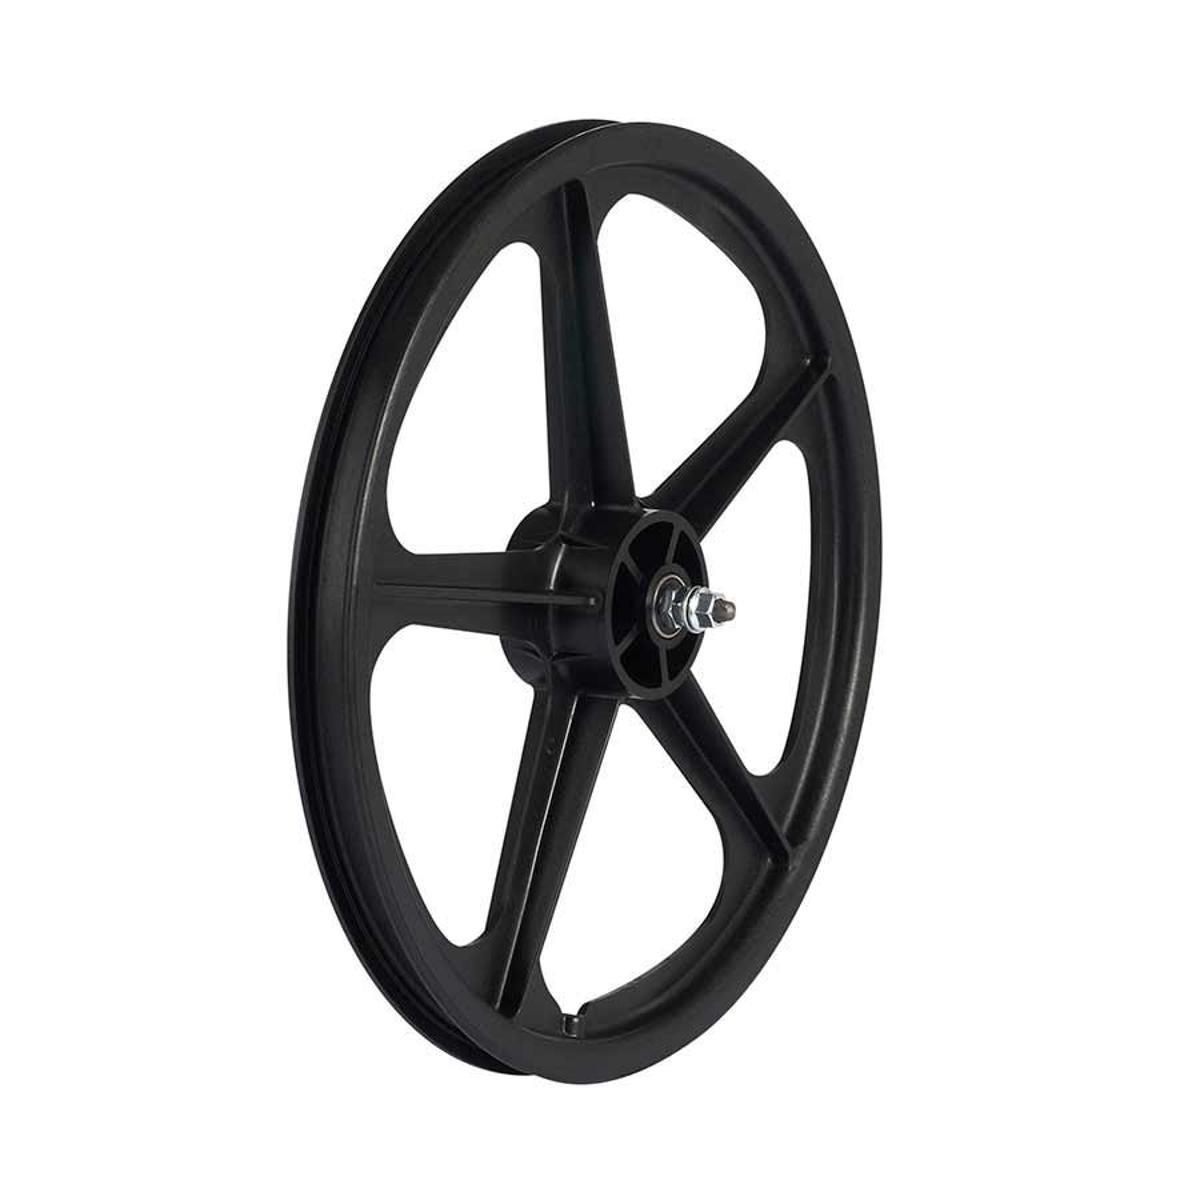 Skyway, Tuff II 20'' 5 Spoke, Wheelset, Black, 20'' / 406, Bolt-on, F: 100, R: 110, Rim, Freewheel